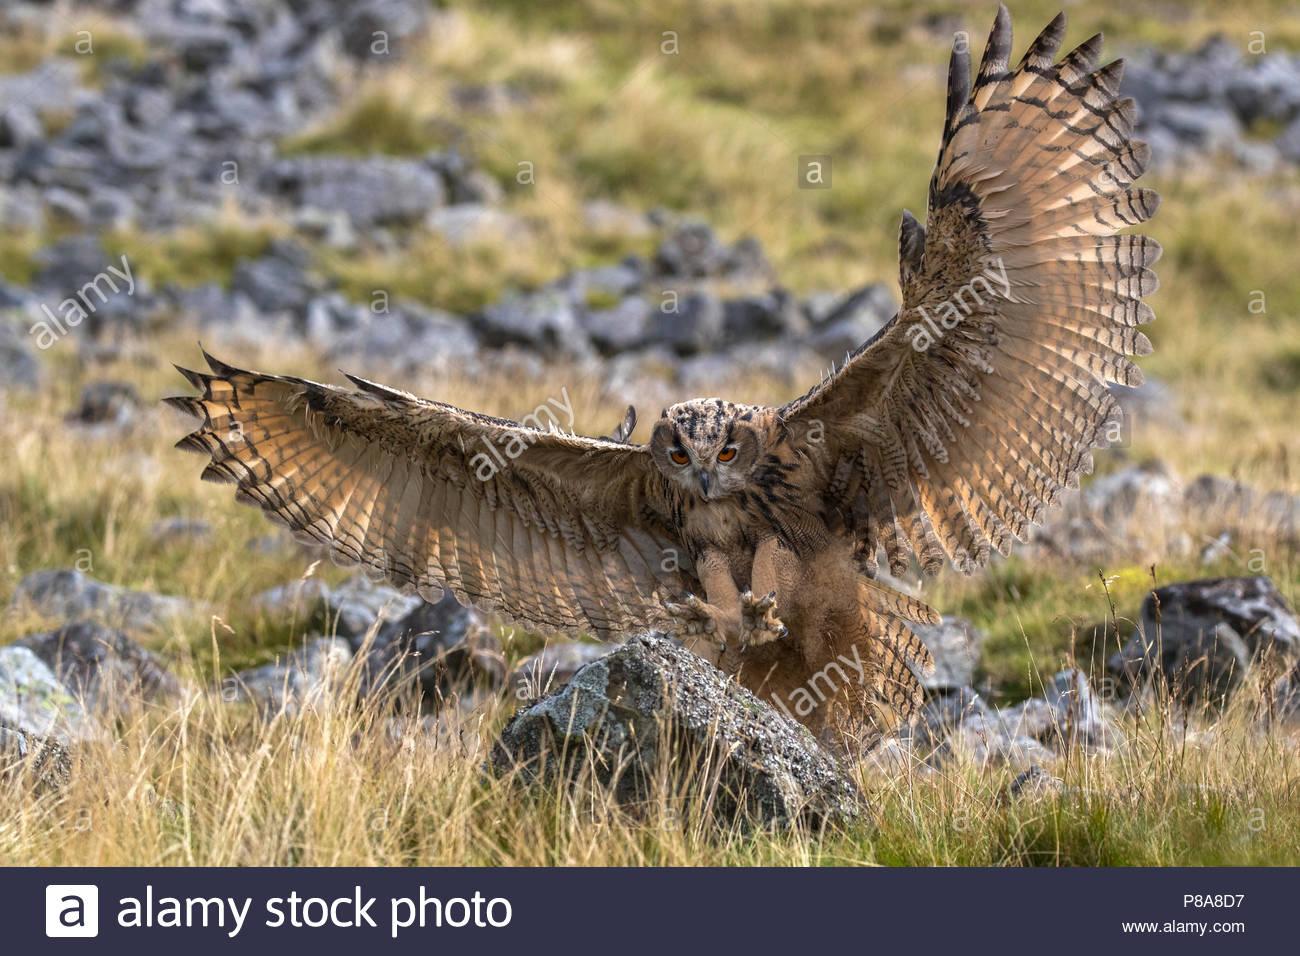 Europäische (Eurasische) Uhu (Bubo bubo) im Flug, Captive, Cumbria, Großbritannien Stockbild